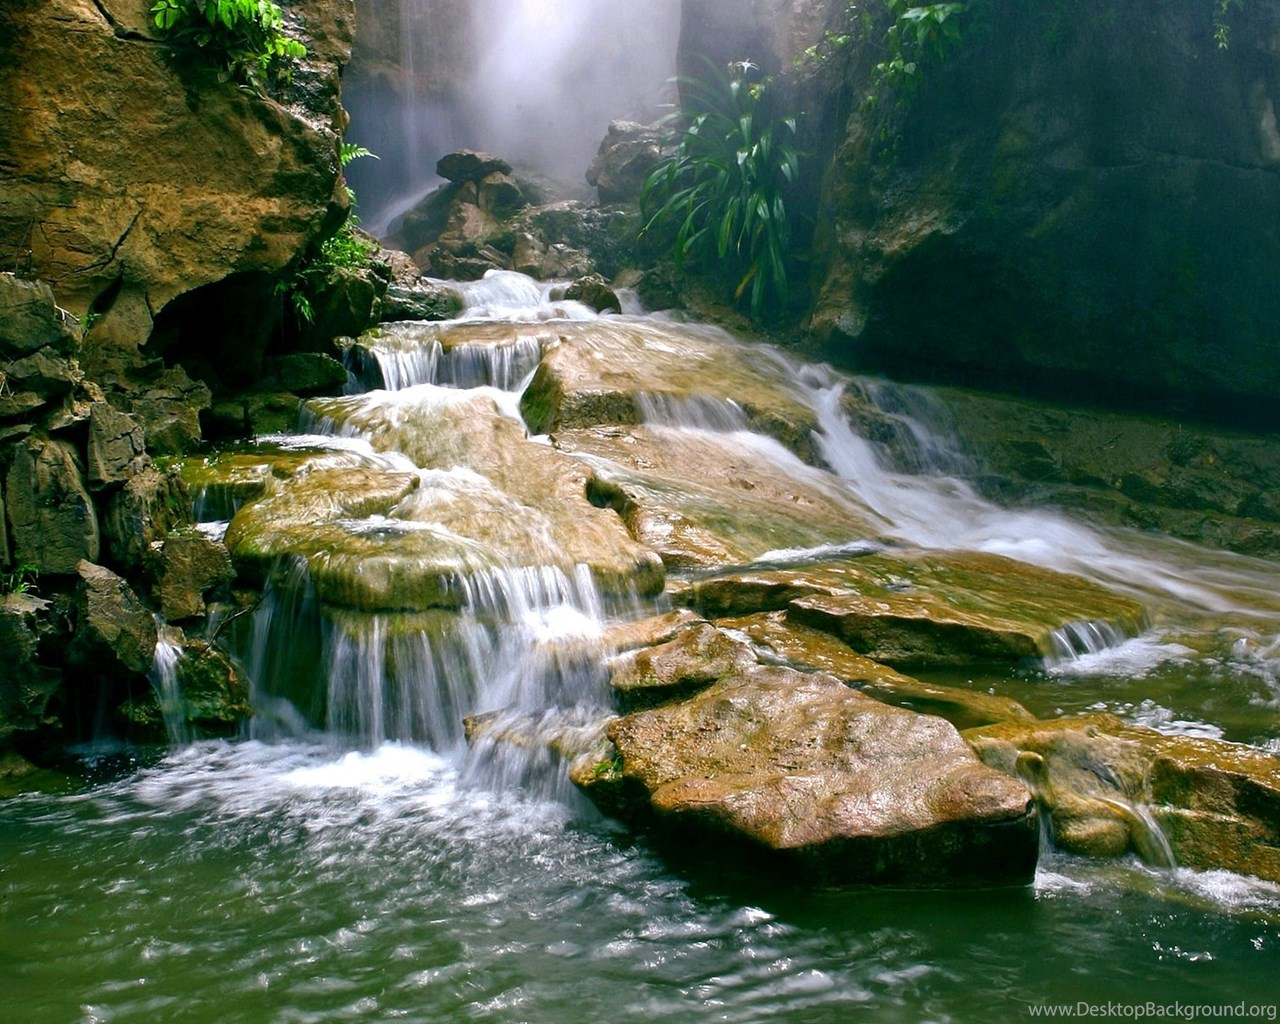 Fond Ecran Cascade Eaux Vives Nature Sauvage Wallpapers Hd Water Desktop Background